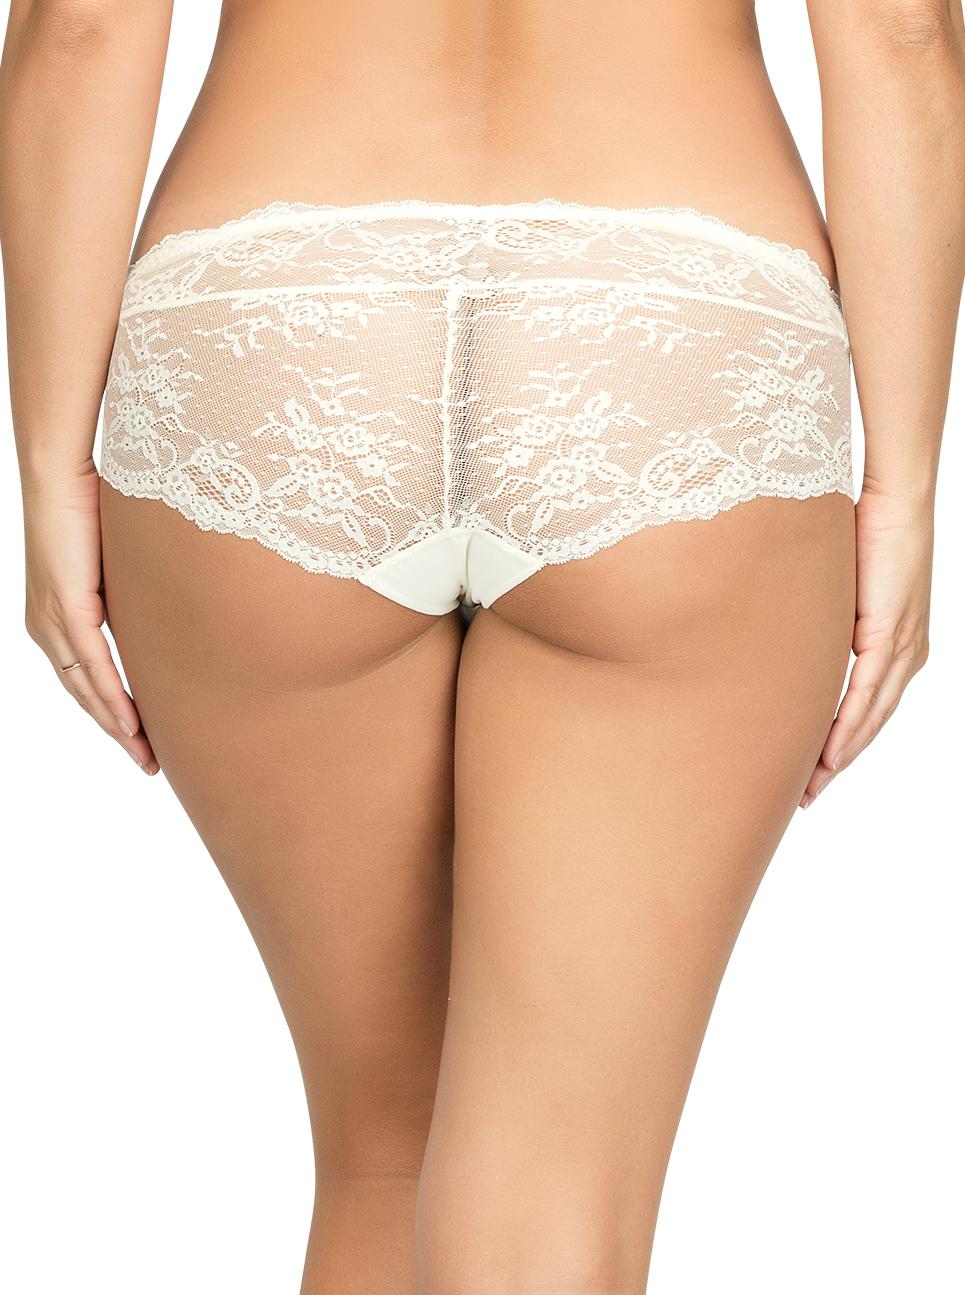 PARFAIT Sandrine HipsterP5355 Ivory Back - Sandrine Hipster - Ivory - P5355